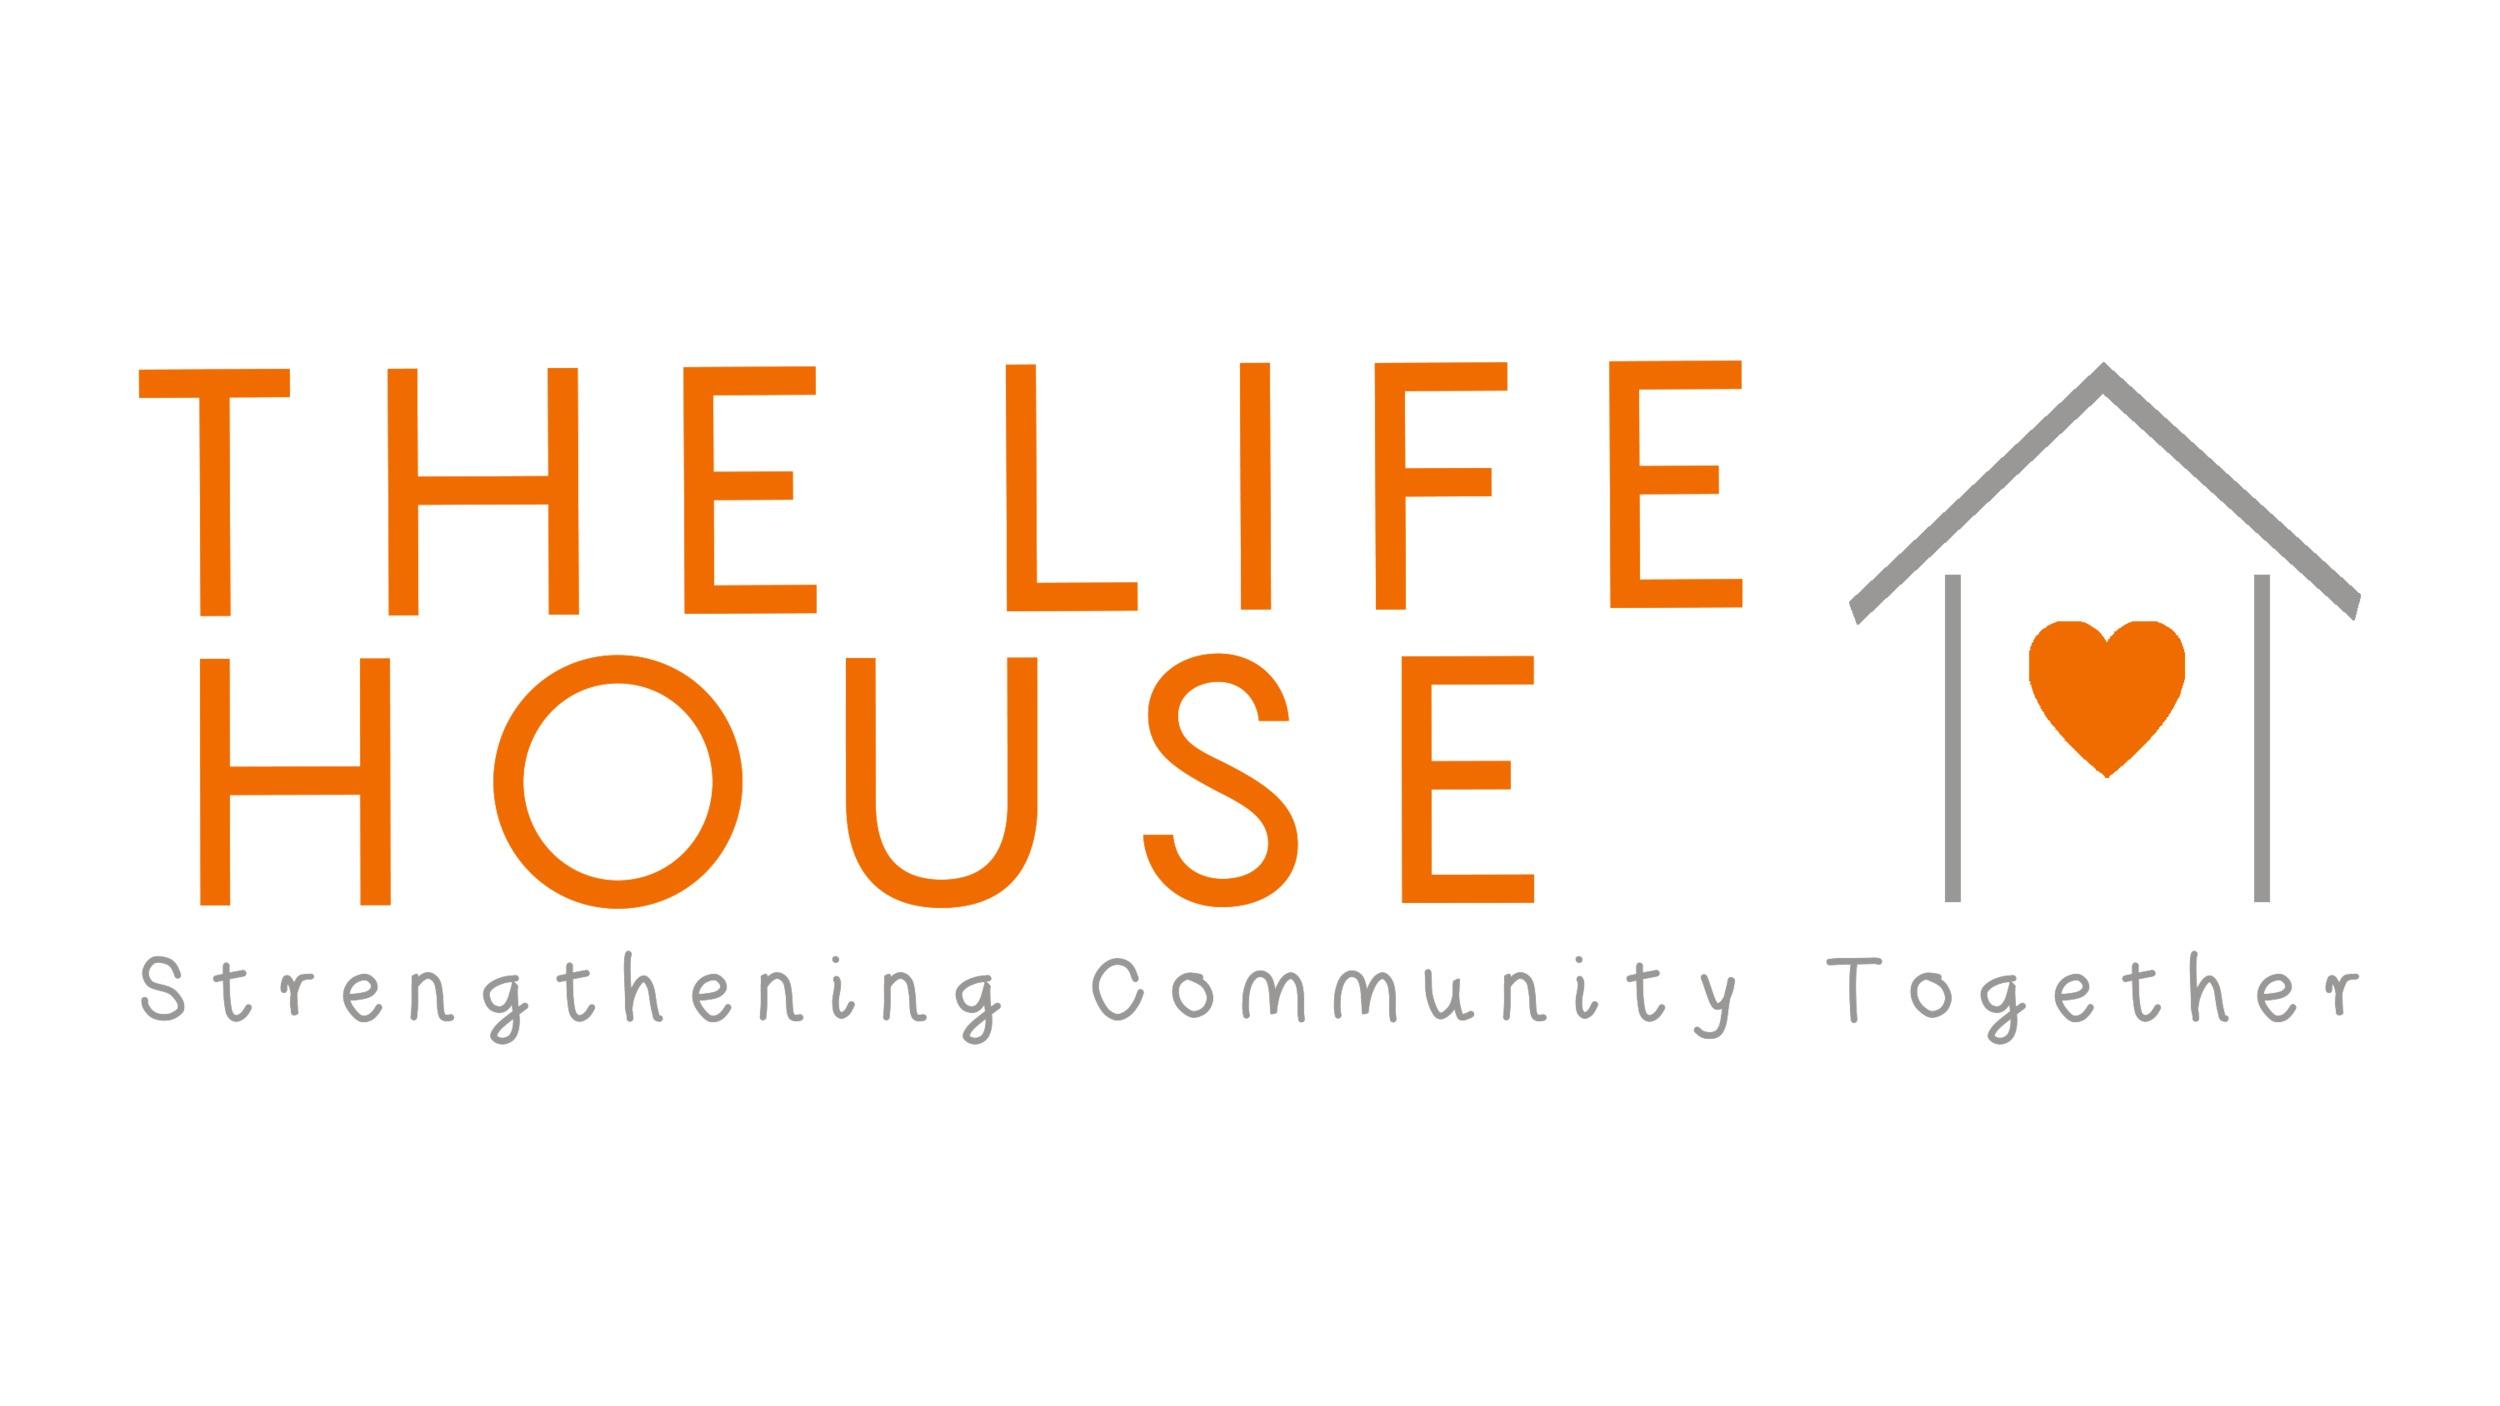 life+house+logo+3+orange+and+grey+.jpg